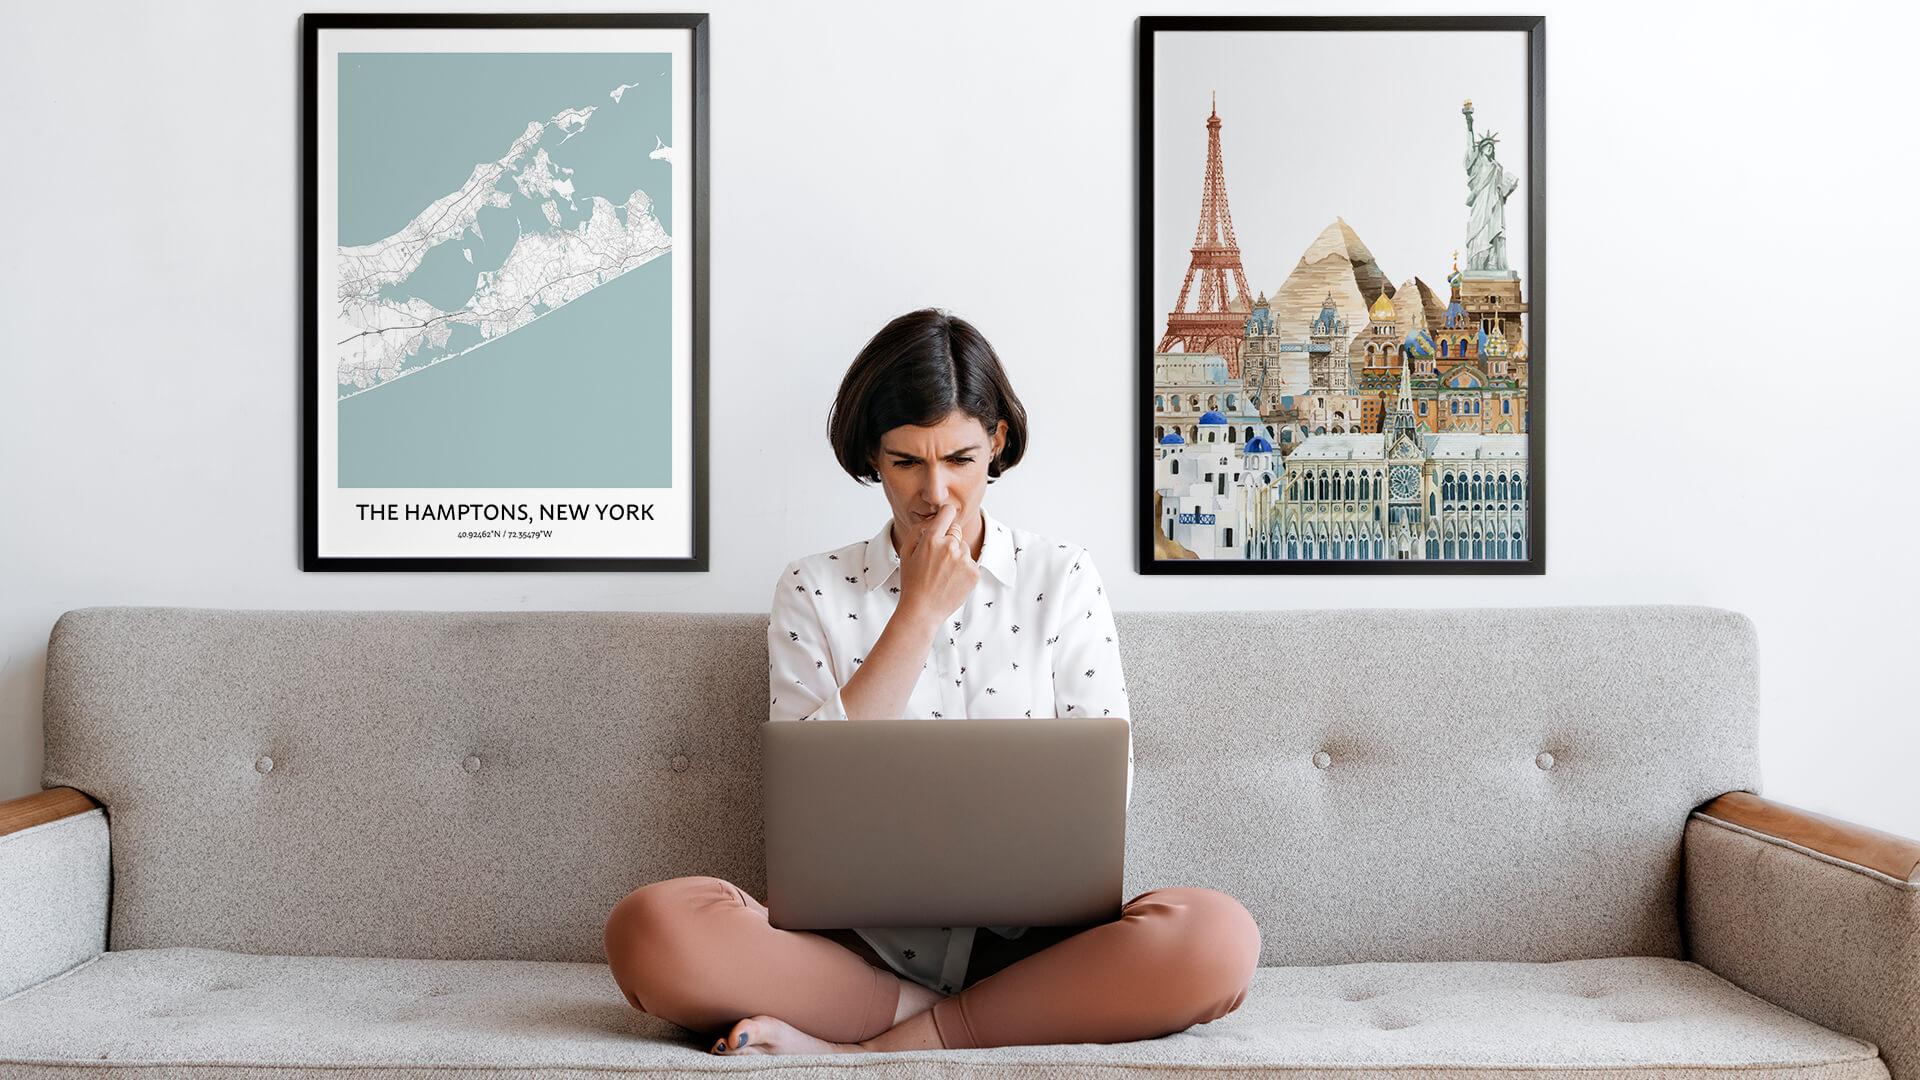 The Hamptons city map art